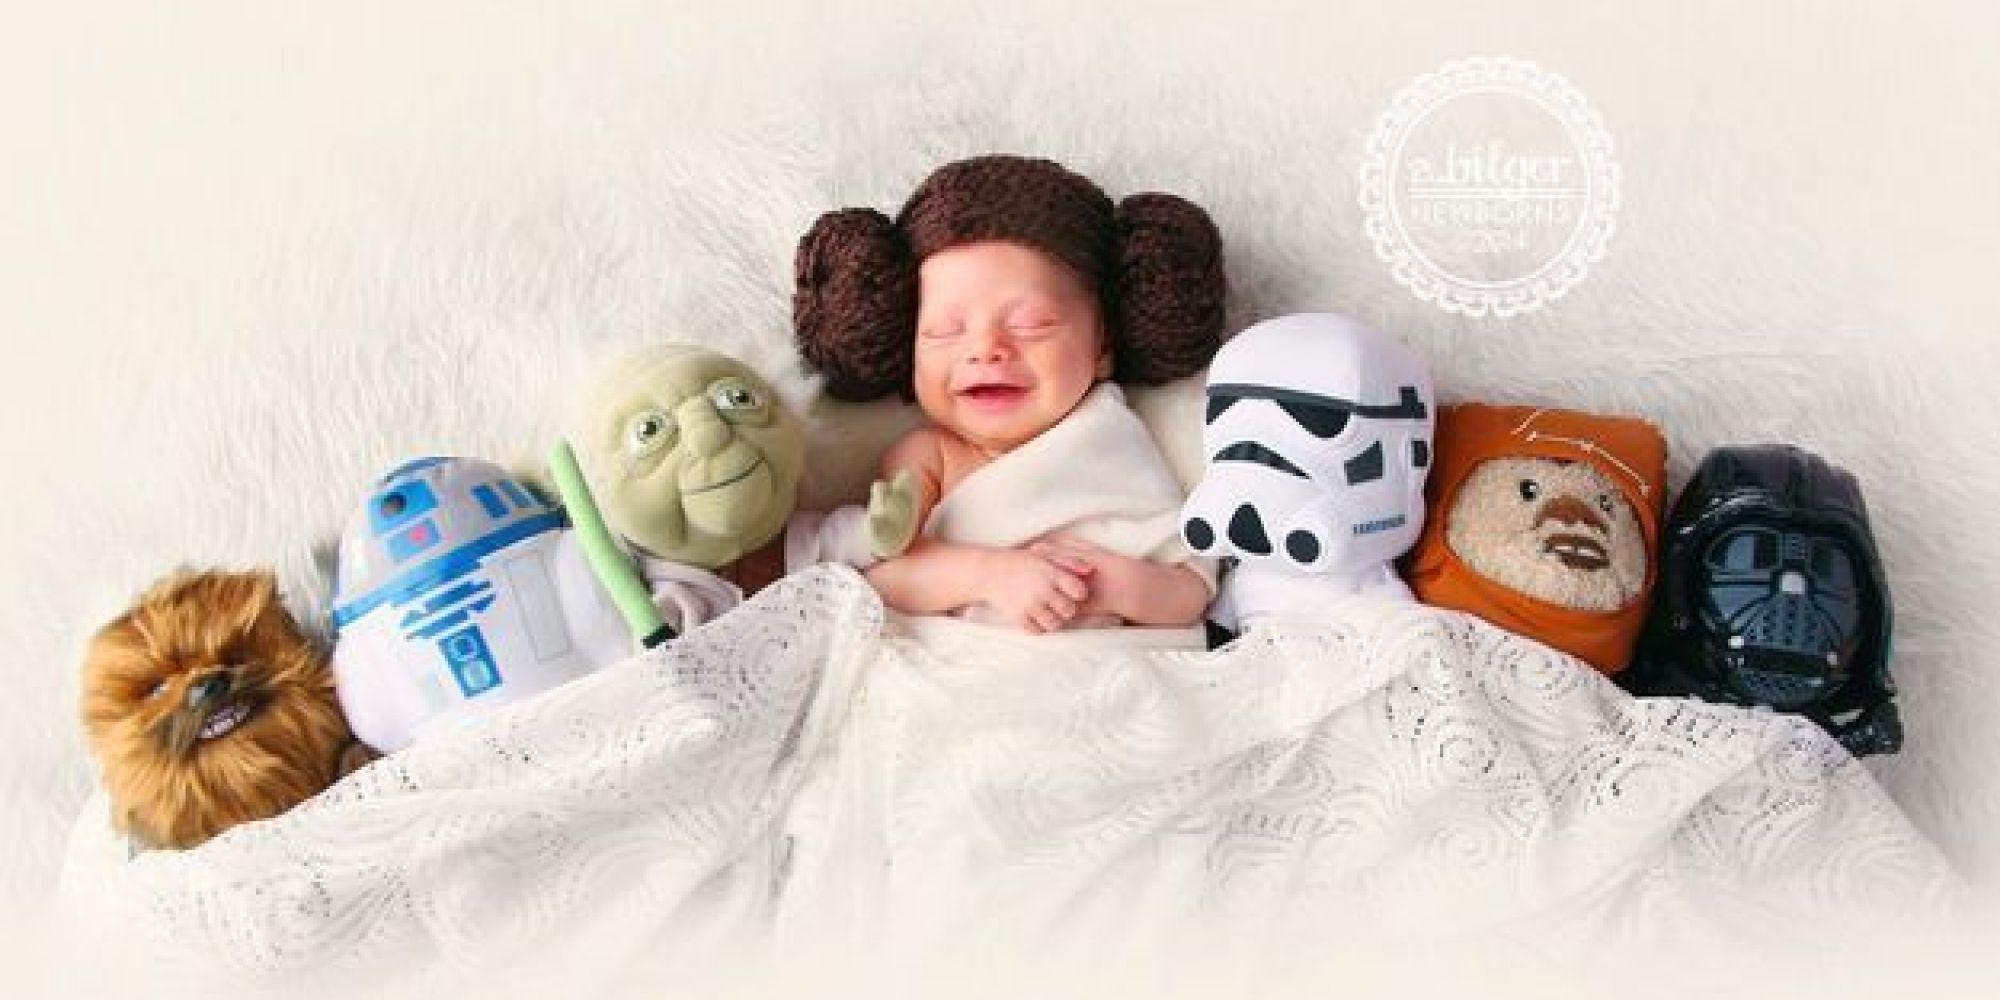 Image result for baby star wars nerd